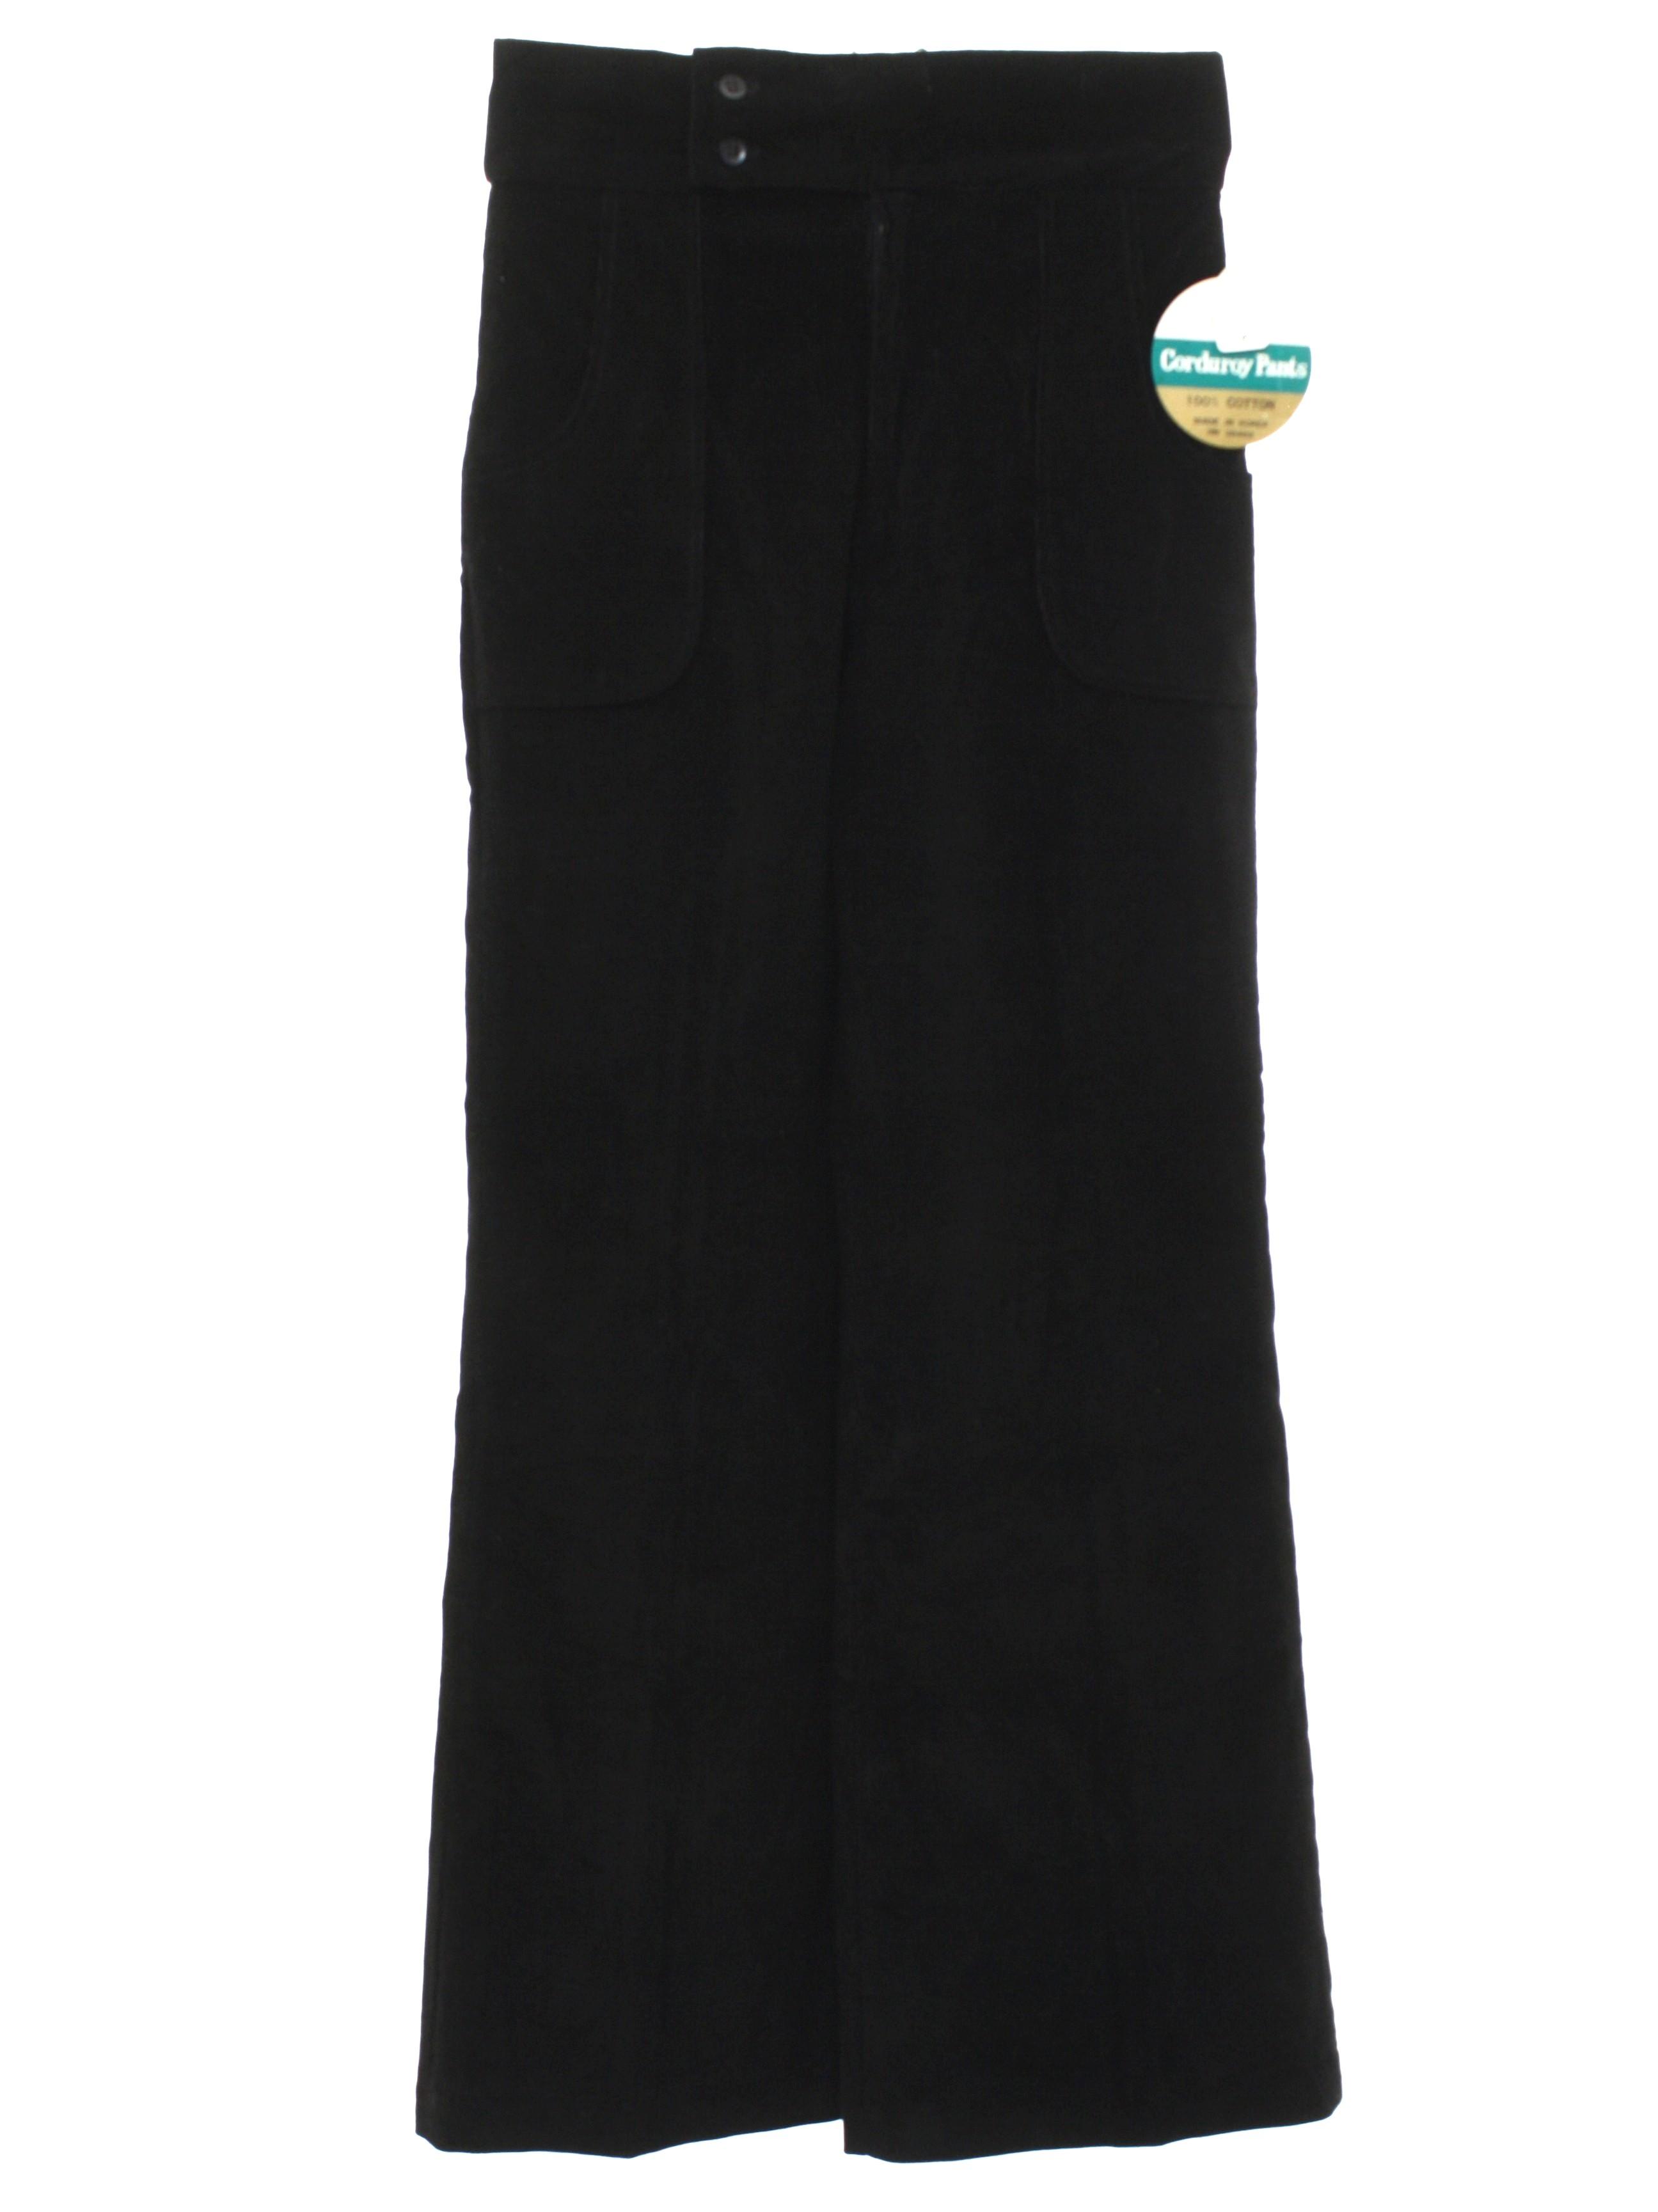 Awesome Stitch39s Womens Black Skinny Jeans Ladies Slim Corduroy Pants Size 8